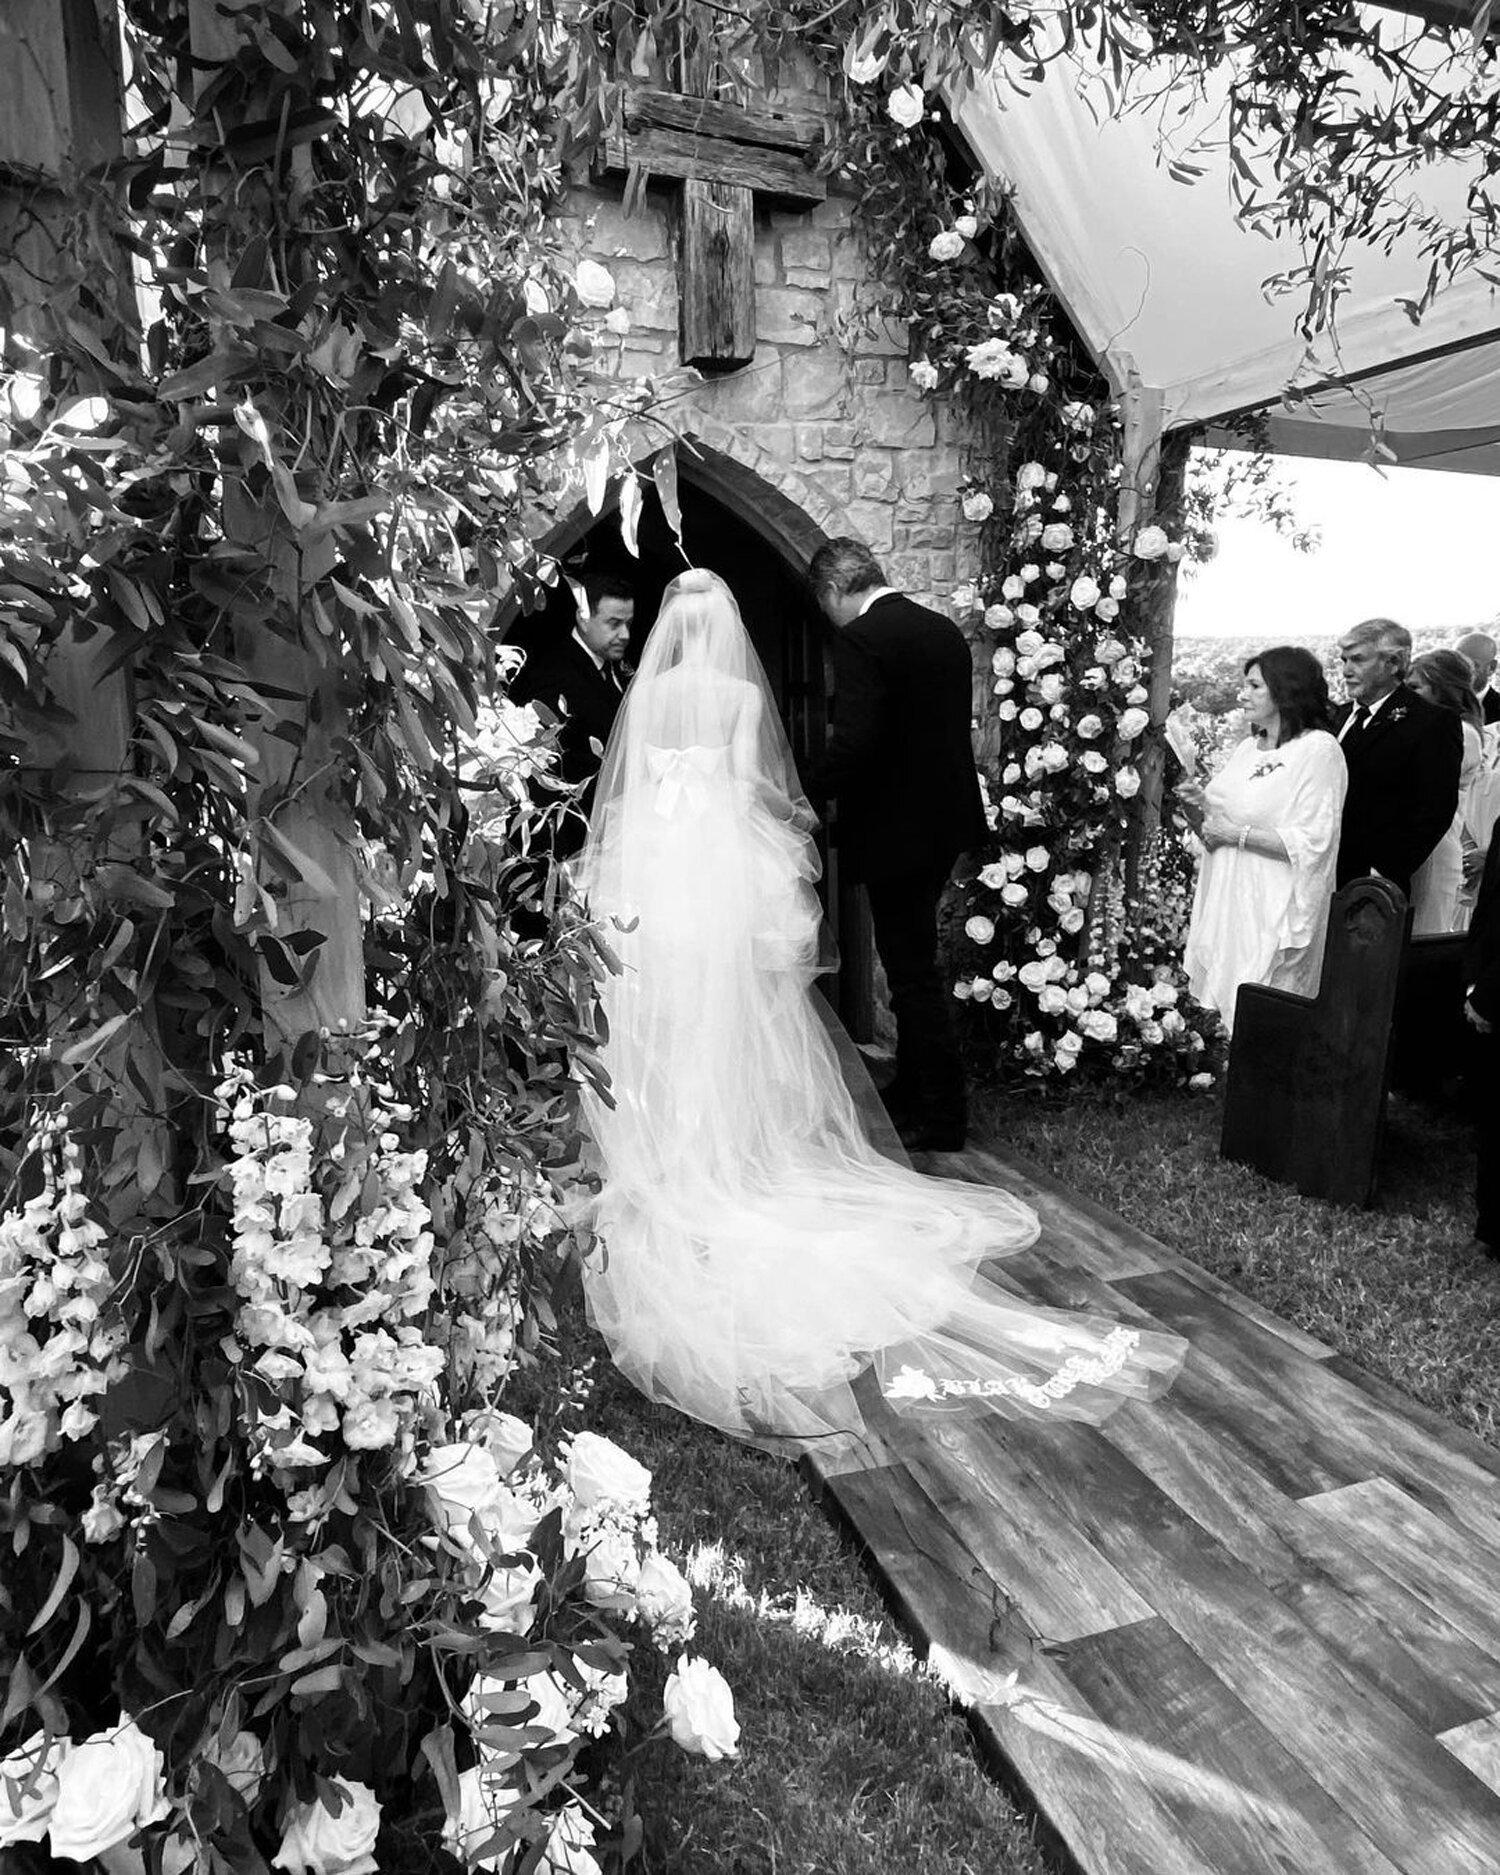 Gwen Stefani Posts Never-Before-Seen Wedding Photo, Wishes Blake Shelton: 'Happy 2 Week Anniversary'